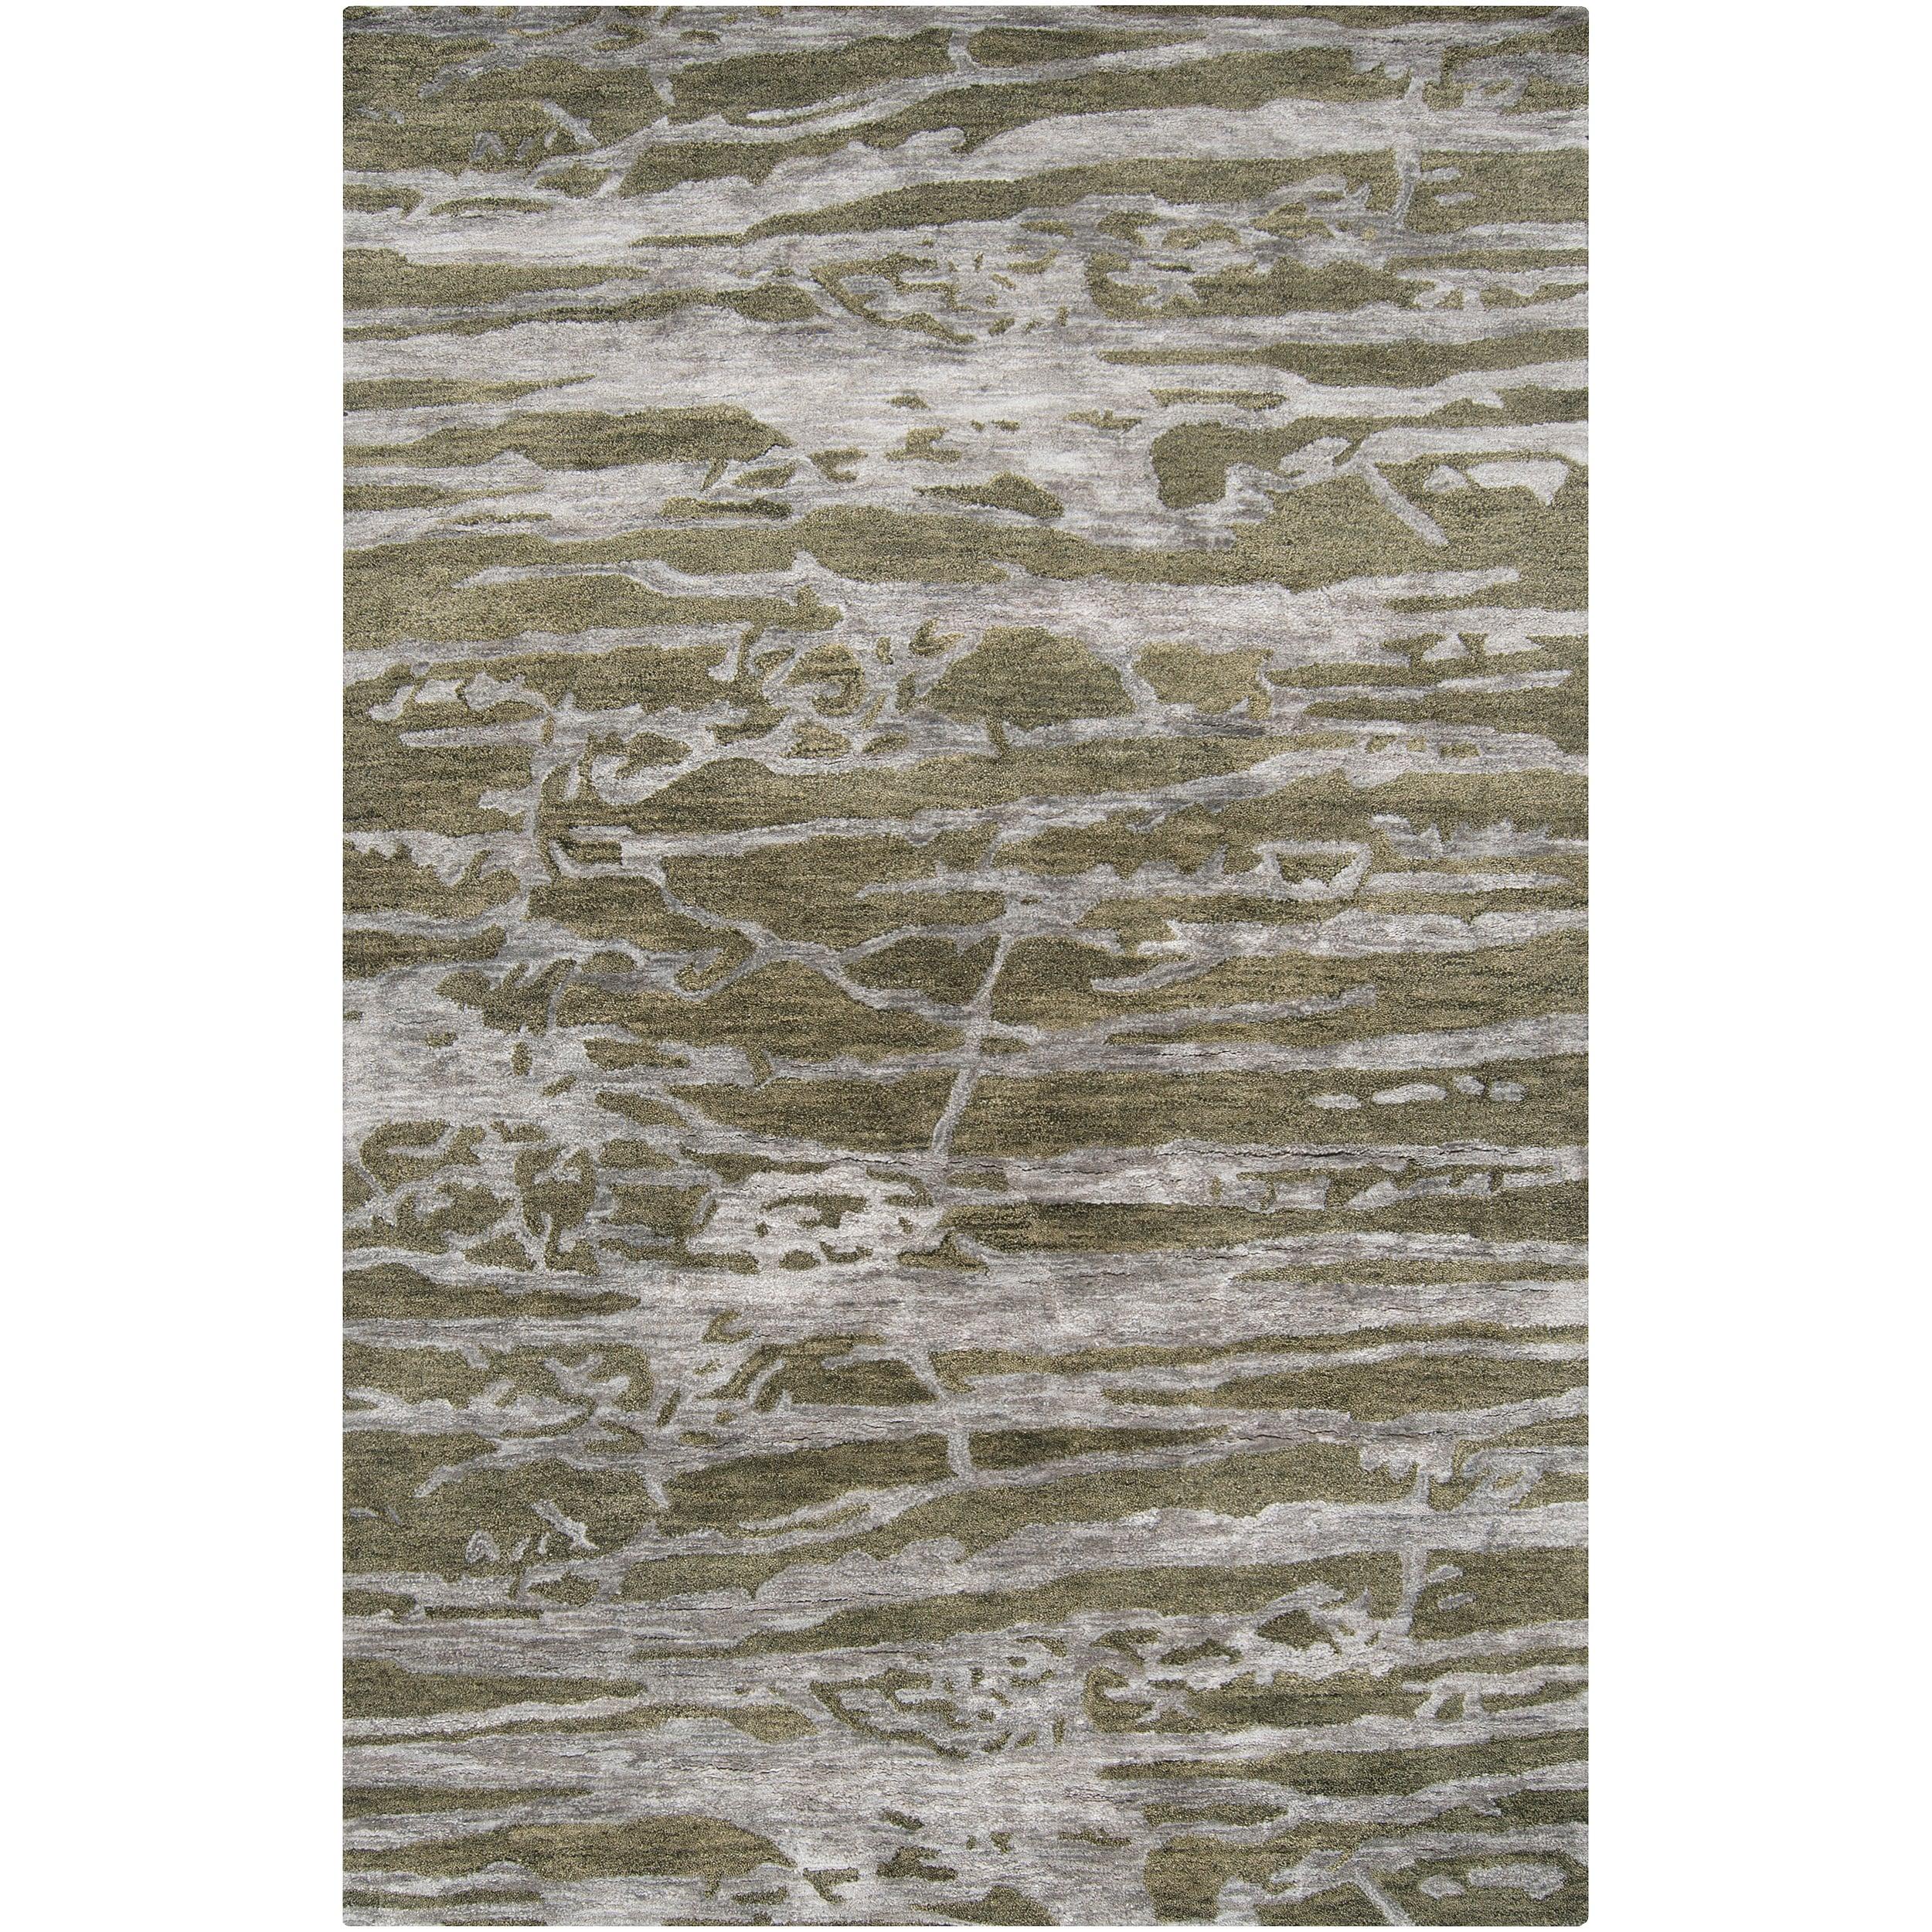 Hand-tufted Green Caparo Street Abstract Wool Area Rug - 5' x 8'